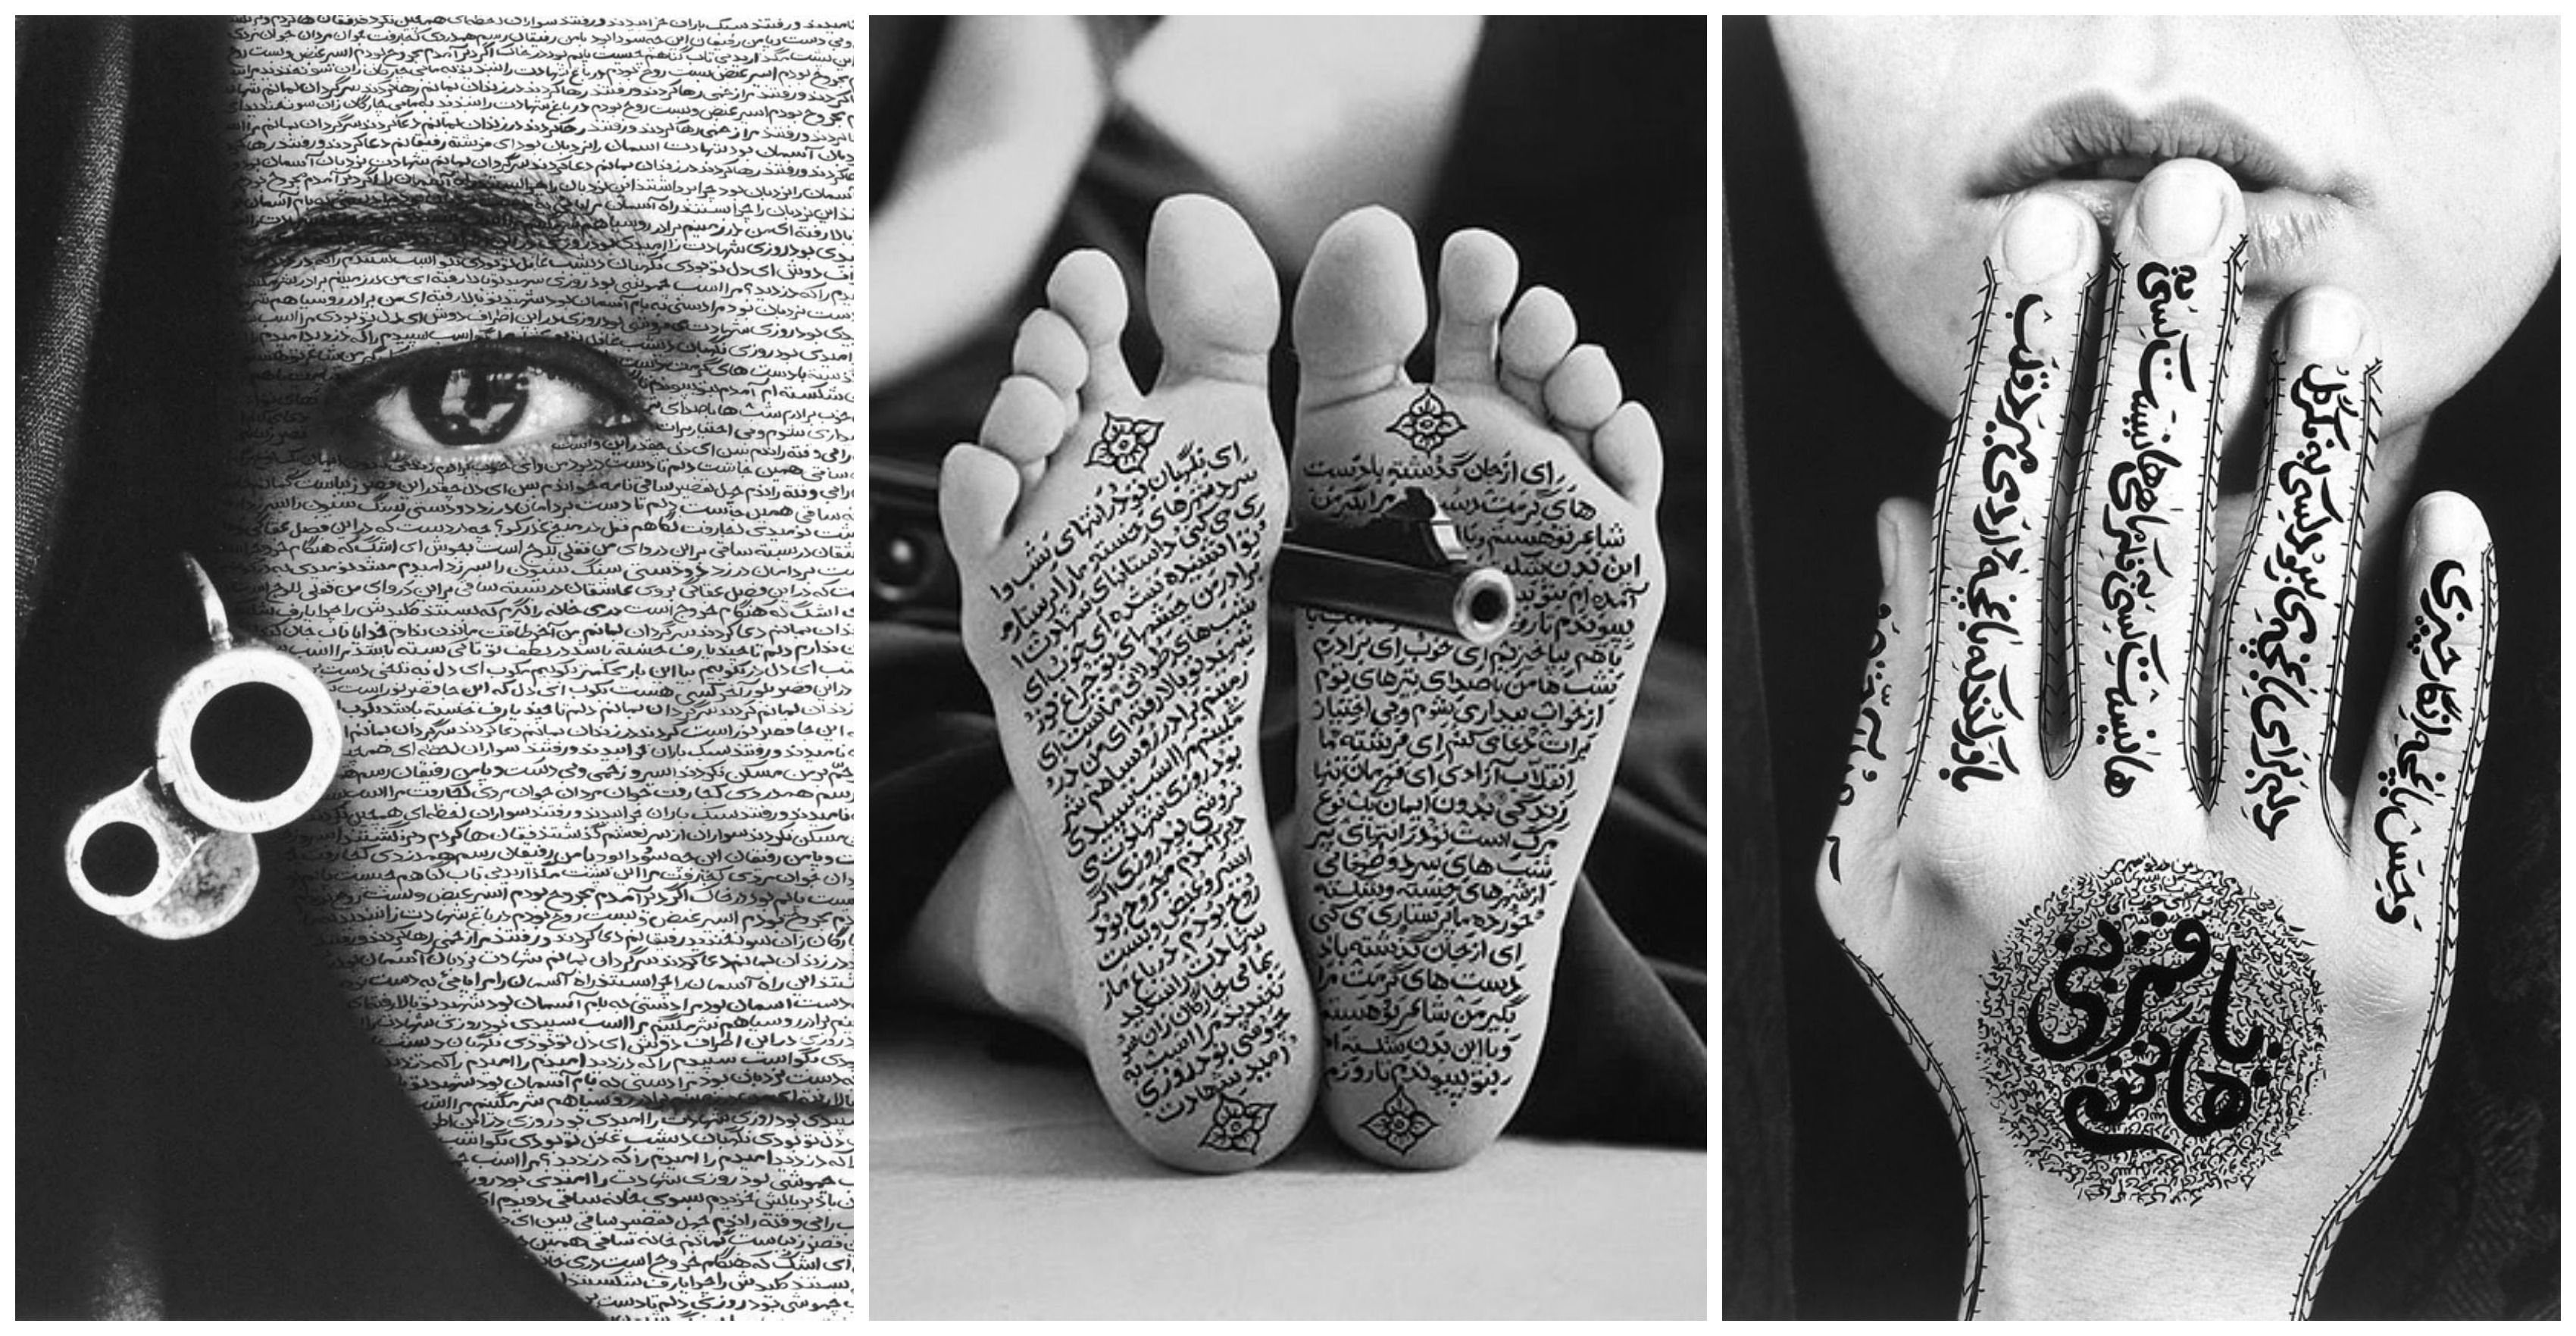 Shirin neshat iraq artist depicting arabic writing with symbols of shirin neshat iraq artist depicting arabic writing with symbols of violence to speak out against the buycottarizona Choice Image